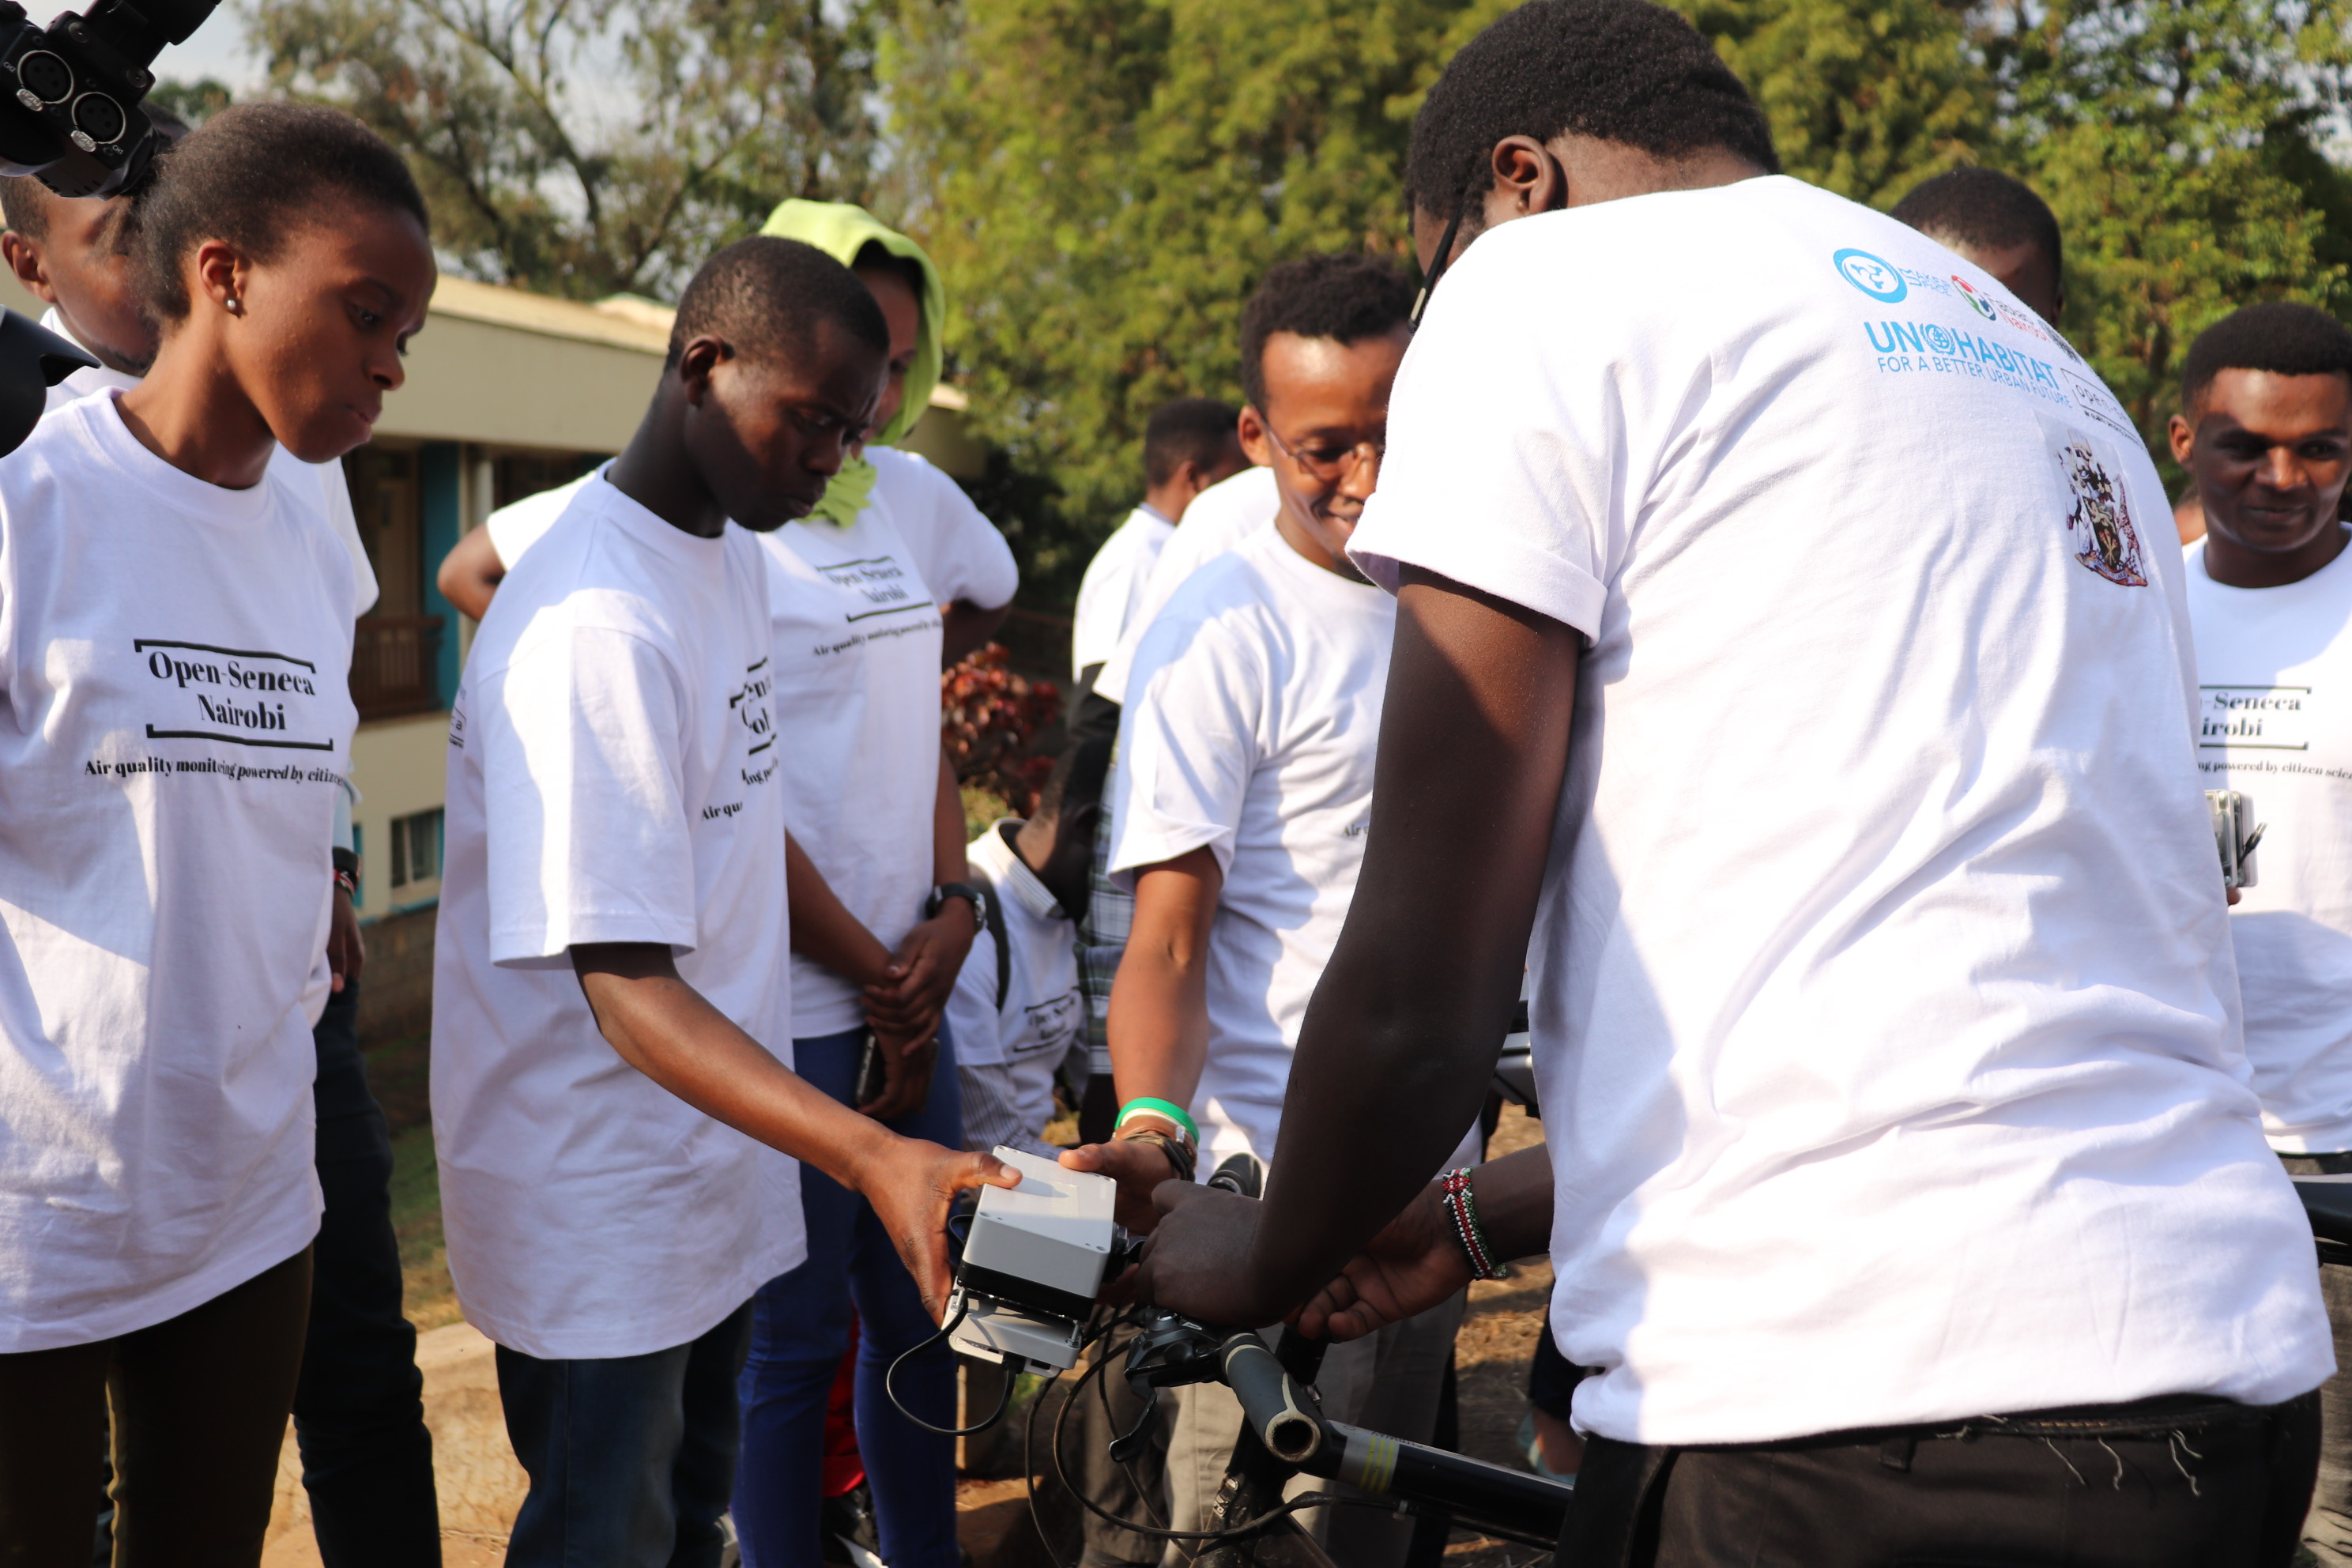 Attaching air quality sensors to bikes in Nairobi